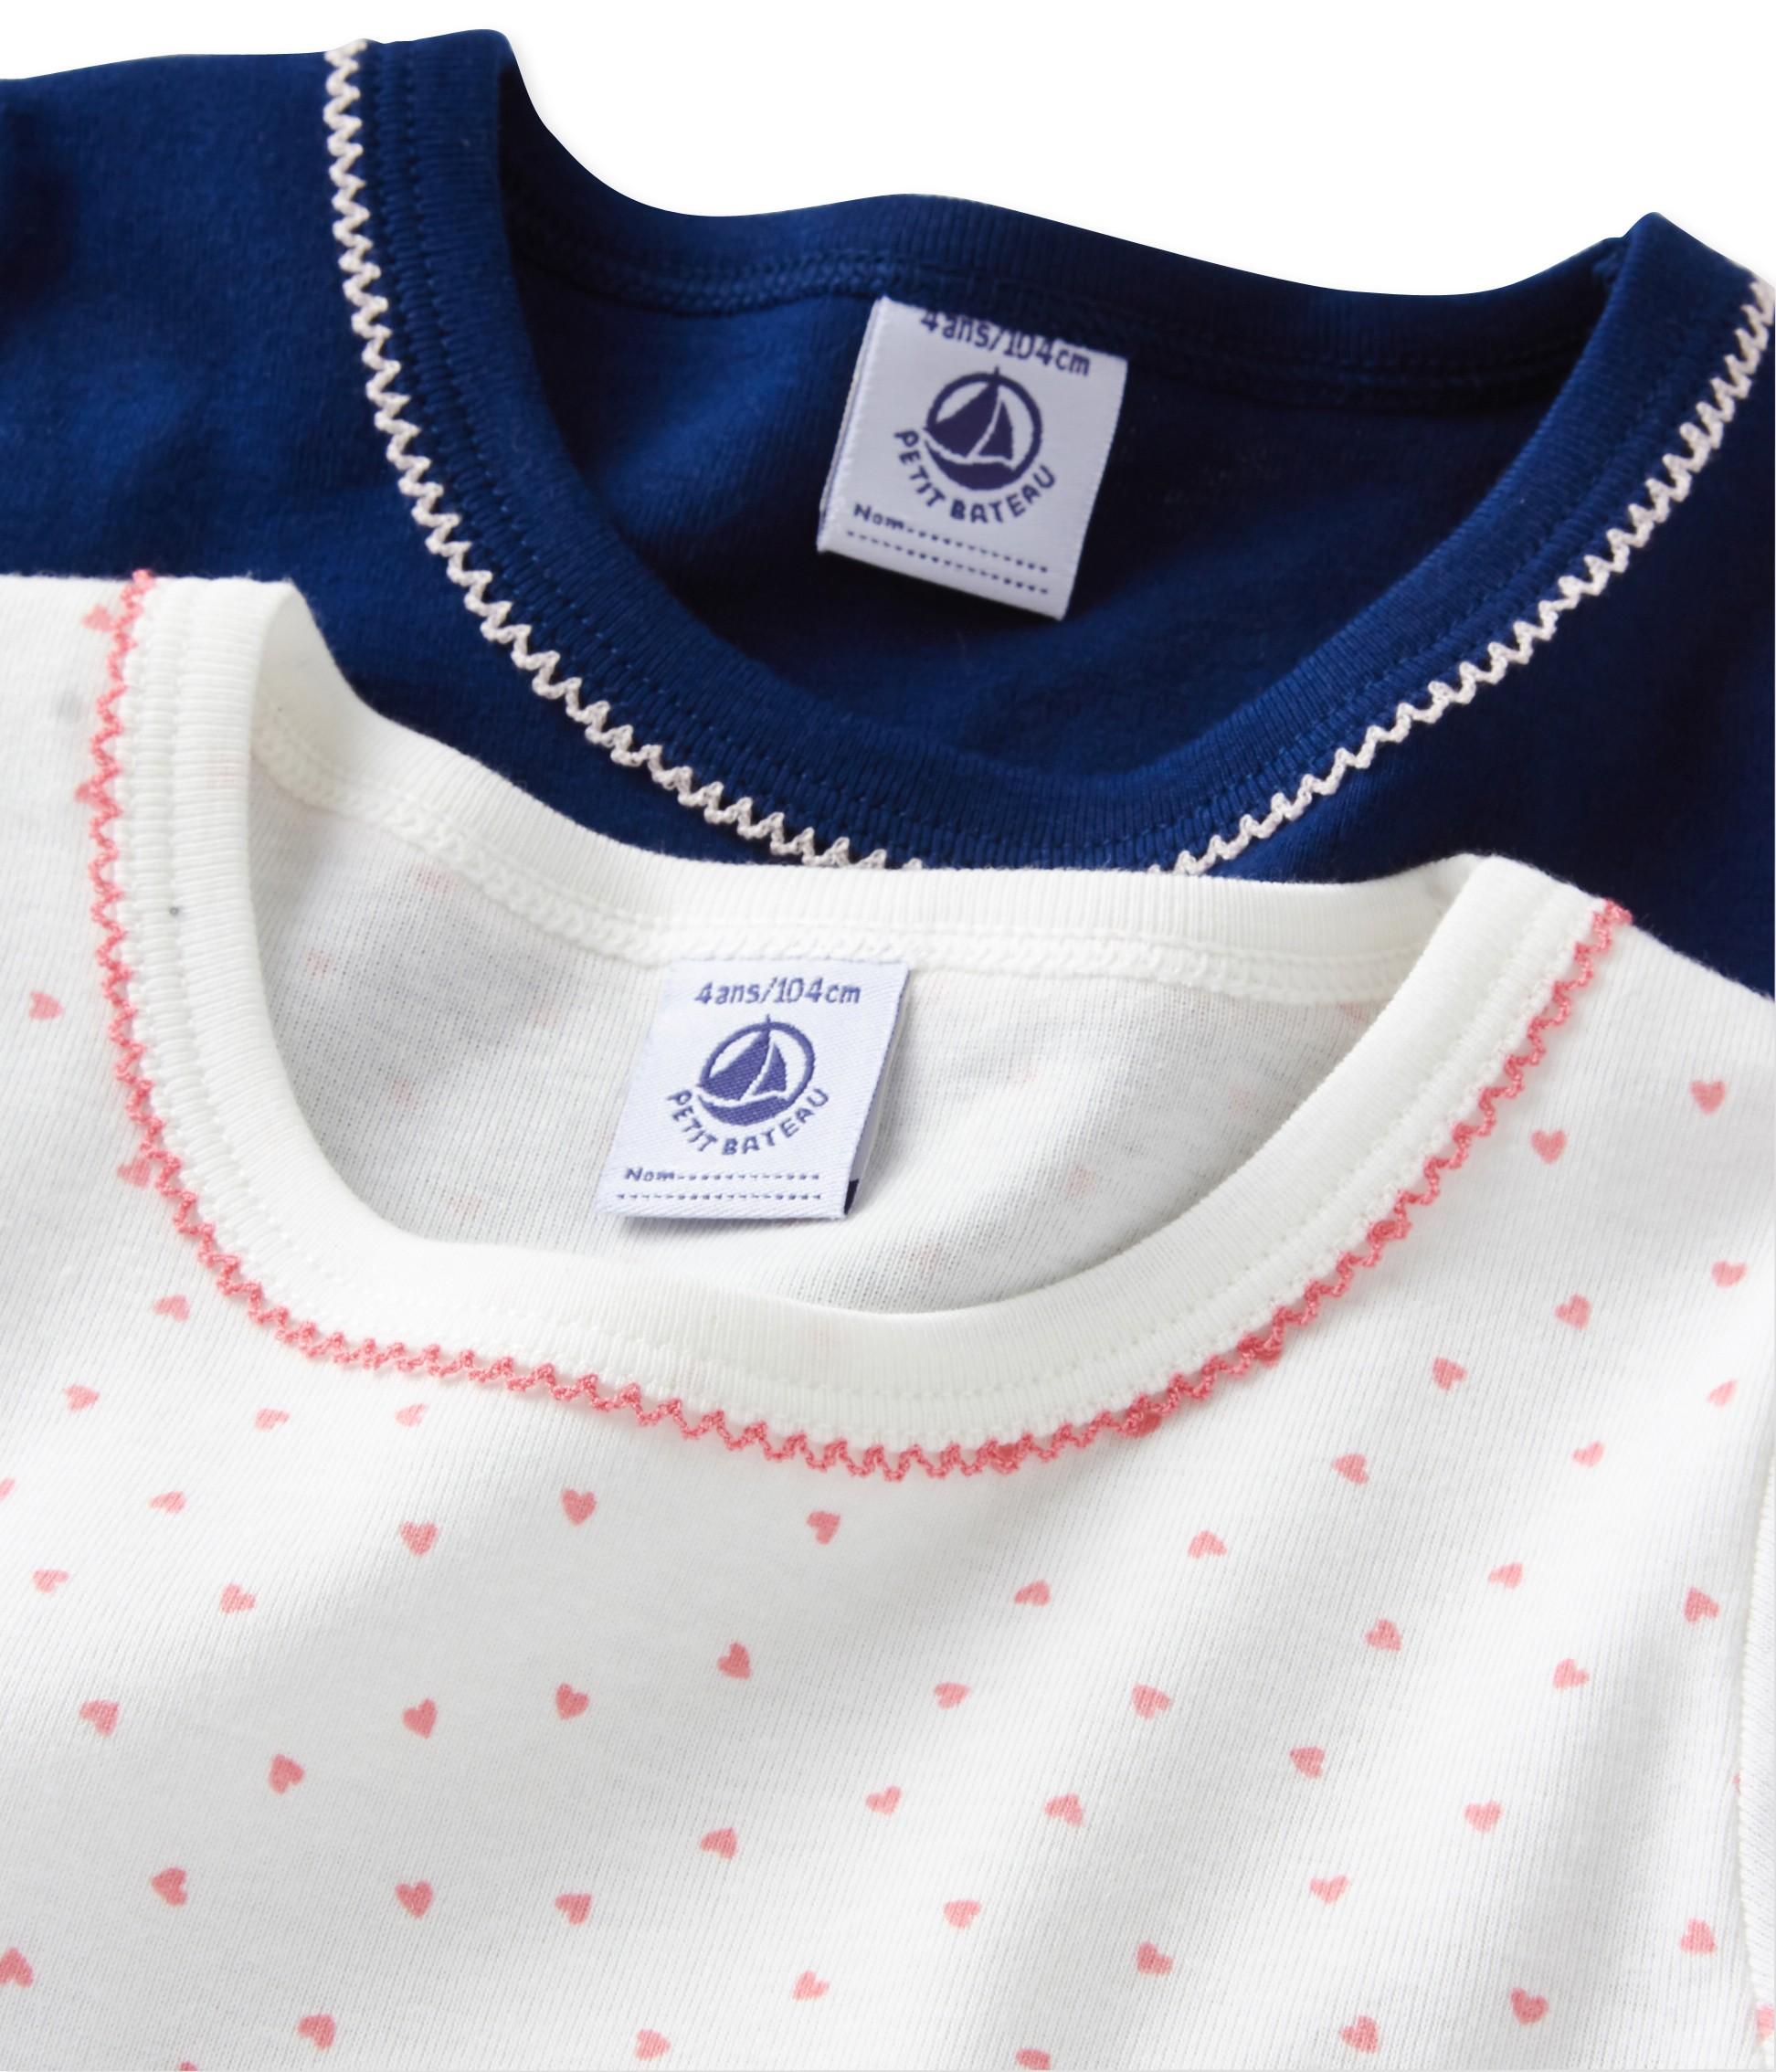 a6203b2b5b97 Σετ 2 μπλούζες κοντομάνικες για κορίτσι - petit-bateau.gr